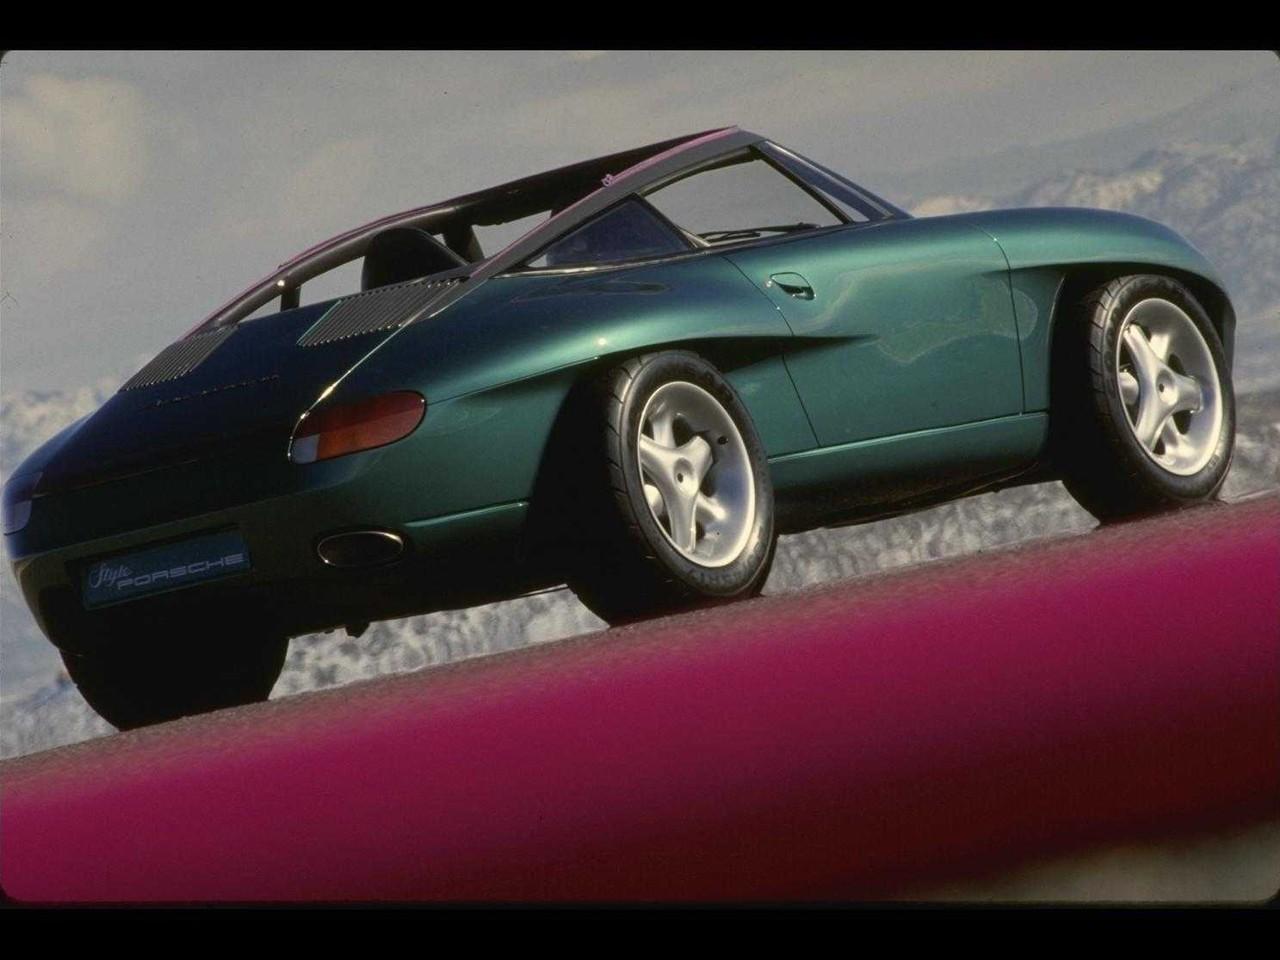 Auto Care Near Me >> Porsche Panamericana Concept (1989) - Old Concept Cars